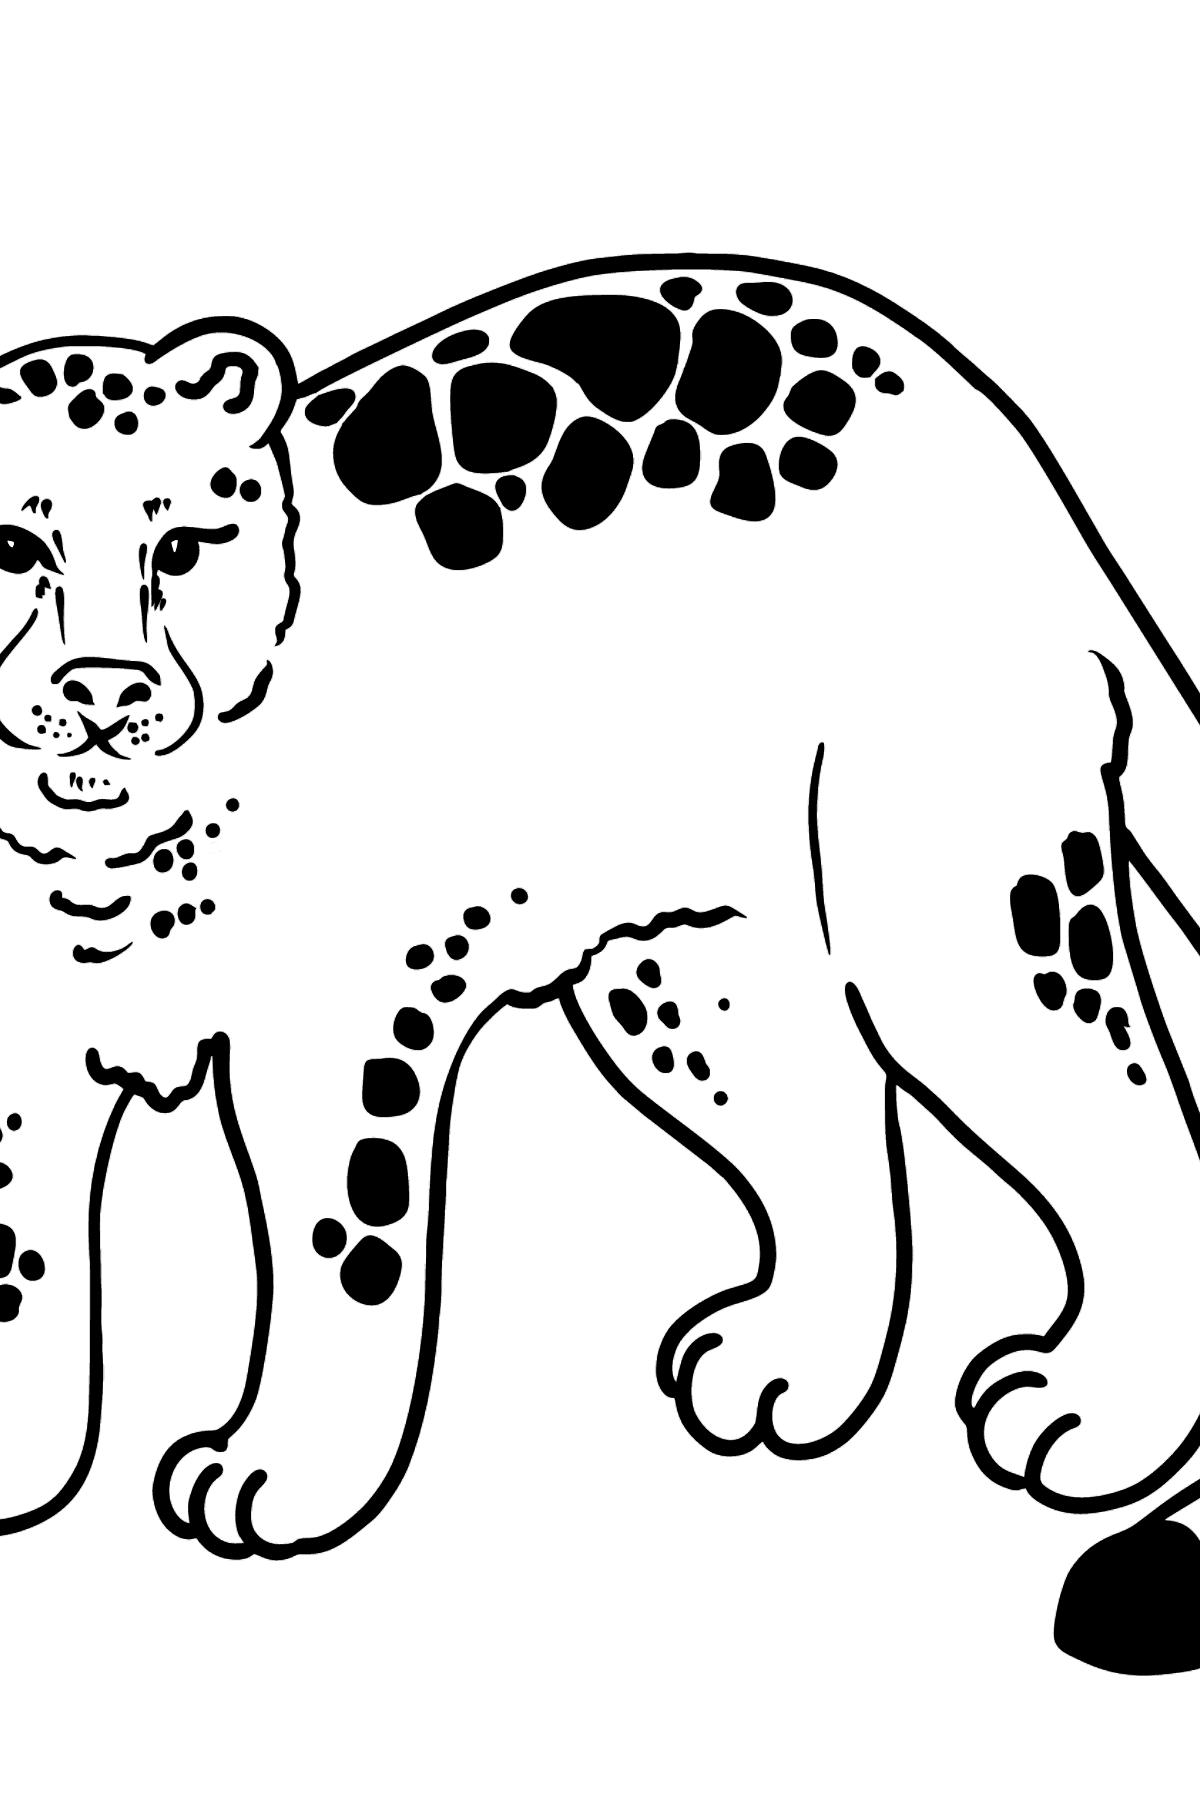 Jaguar coloring page - Coloring Pages for Kids